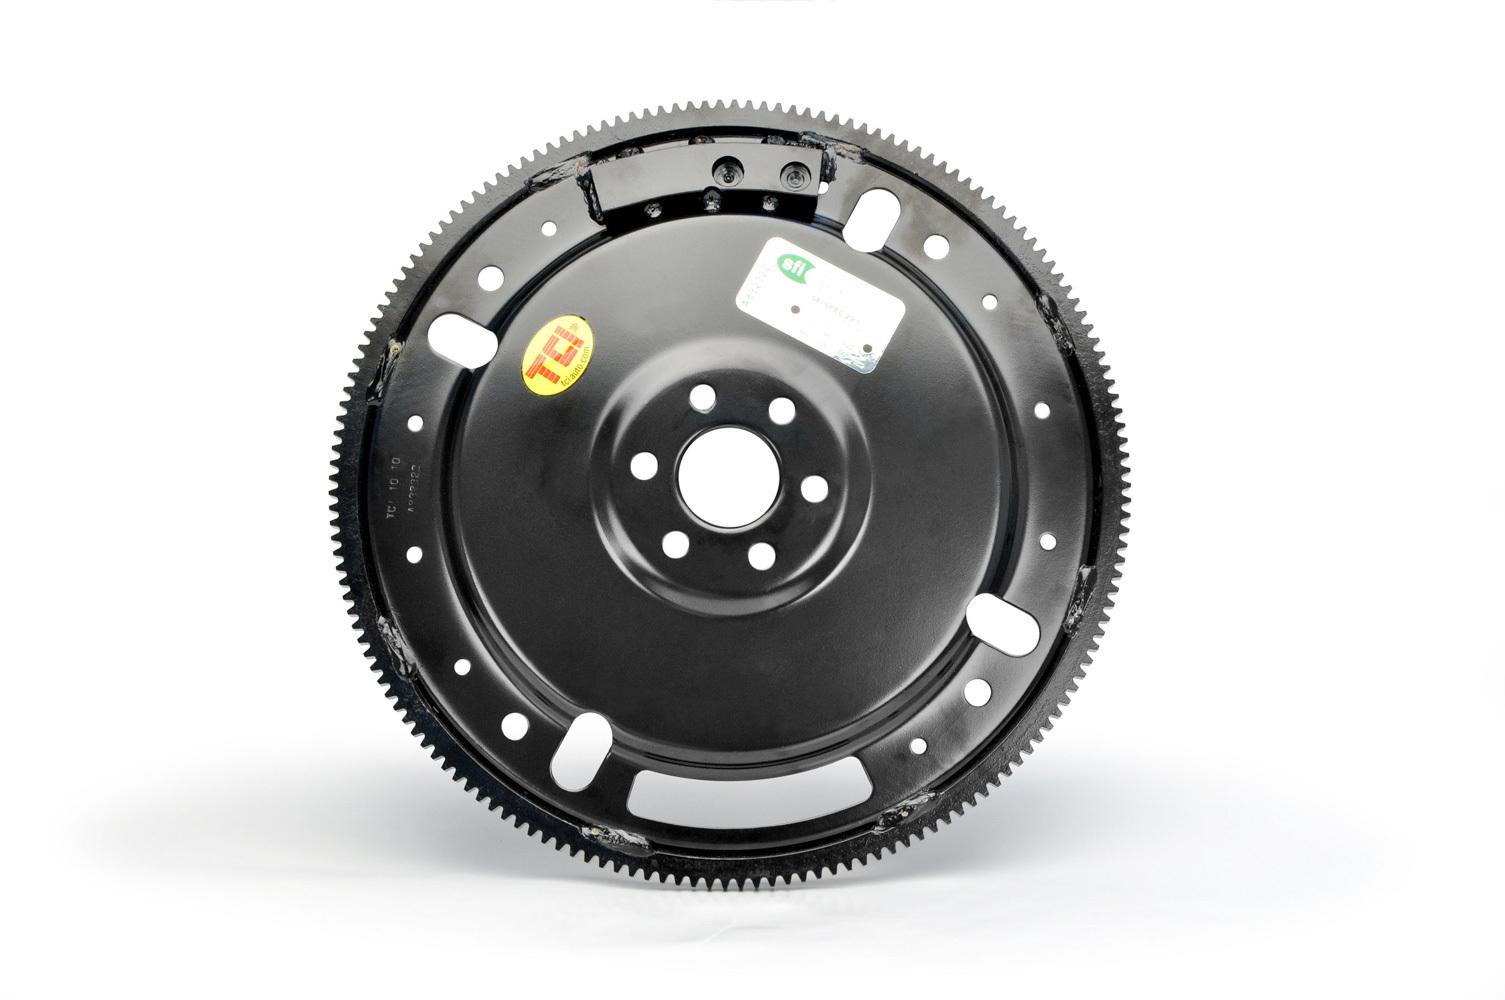 TCI 529618 Flexplate, 157 Tooth, SFI 29.1, Steel, 28 oz External Balance, 10.5 in Bolt Circle, Ford V8, Each